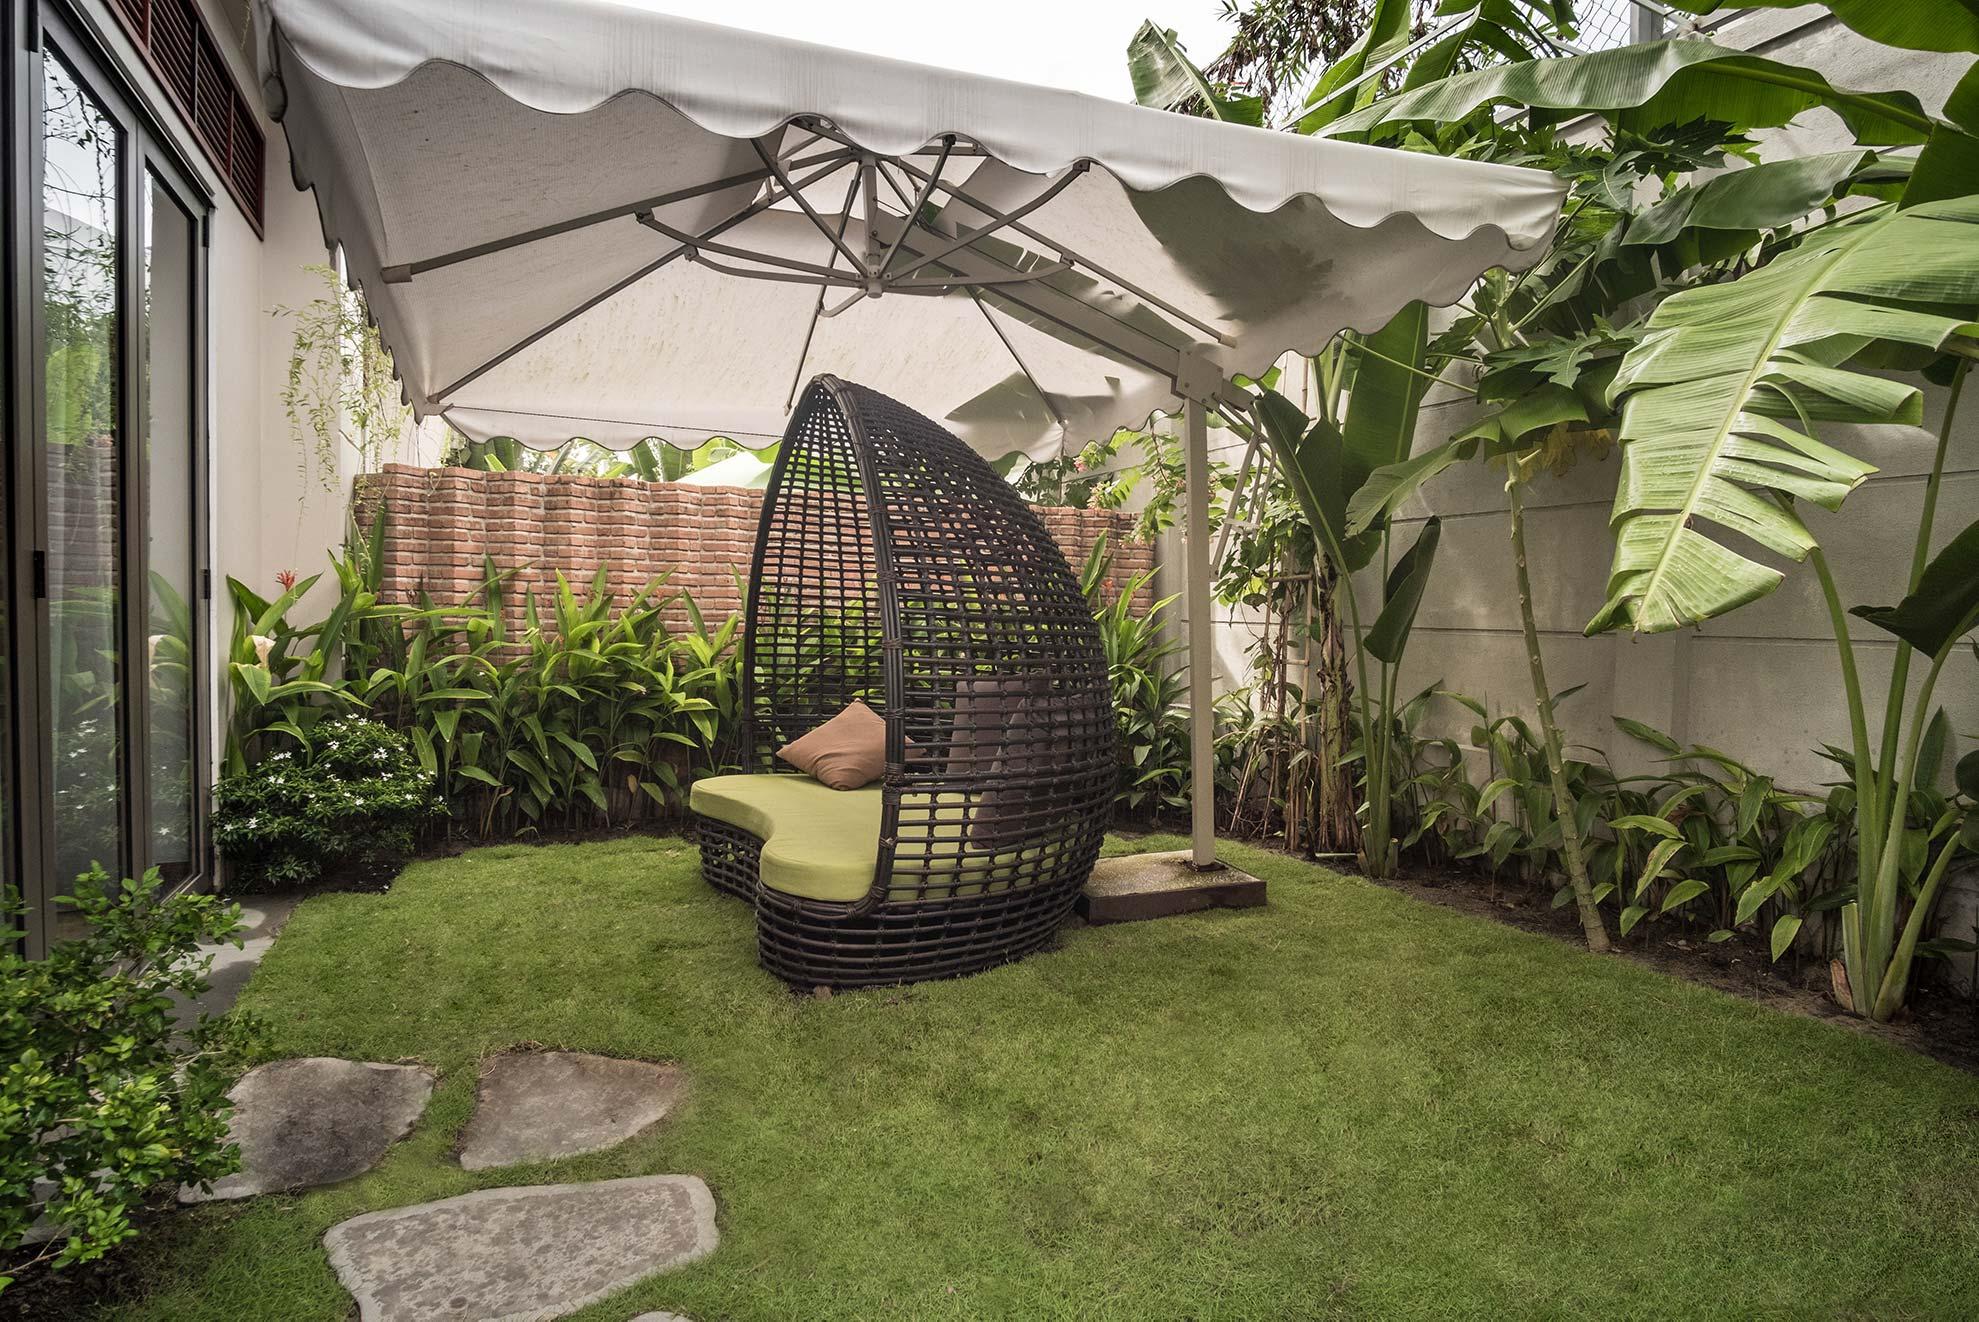 Deluxe Private Garden (5)